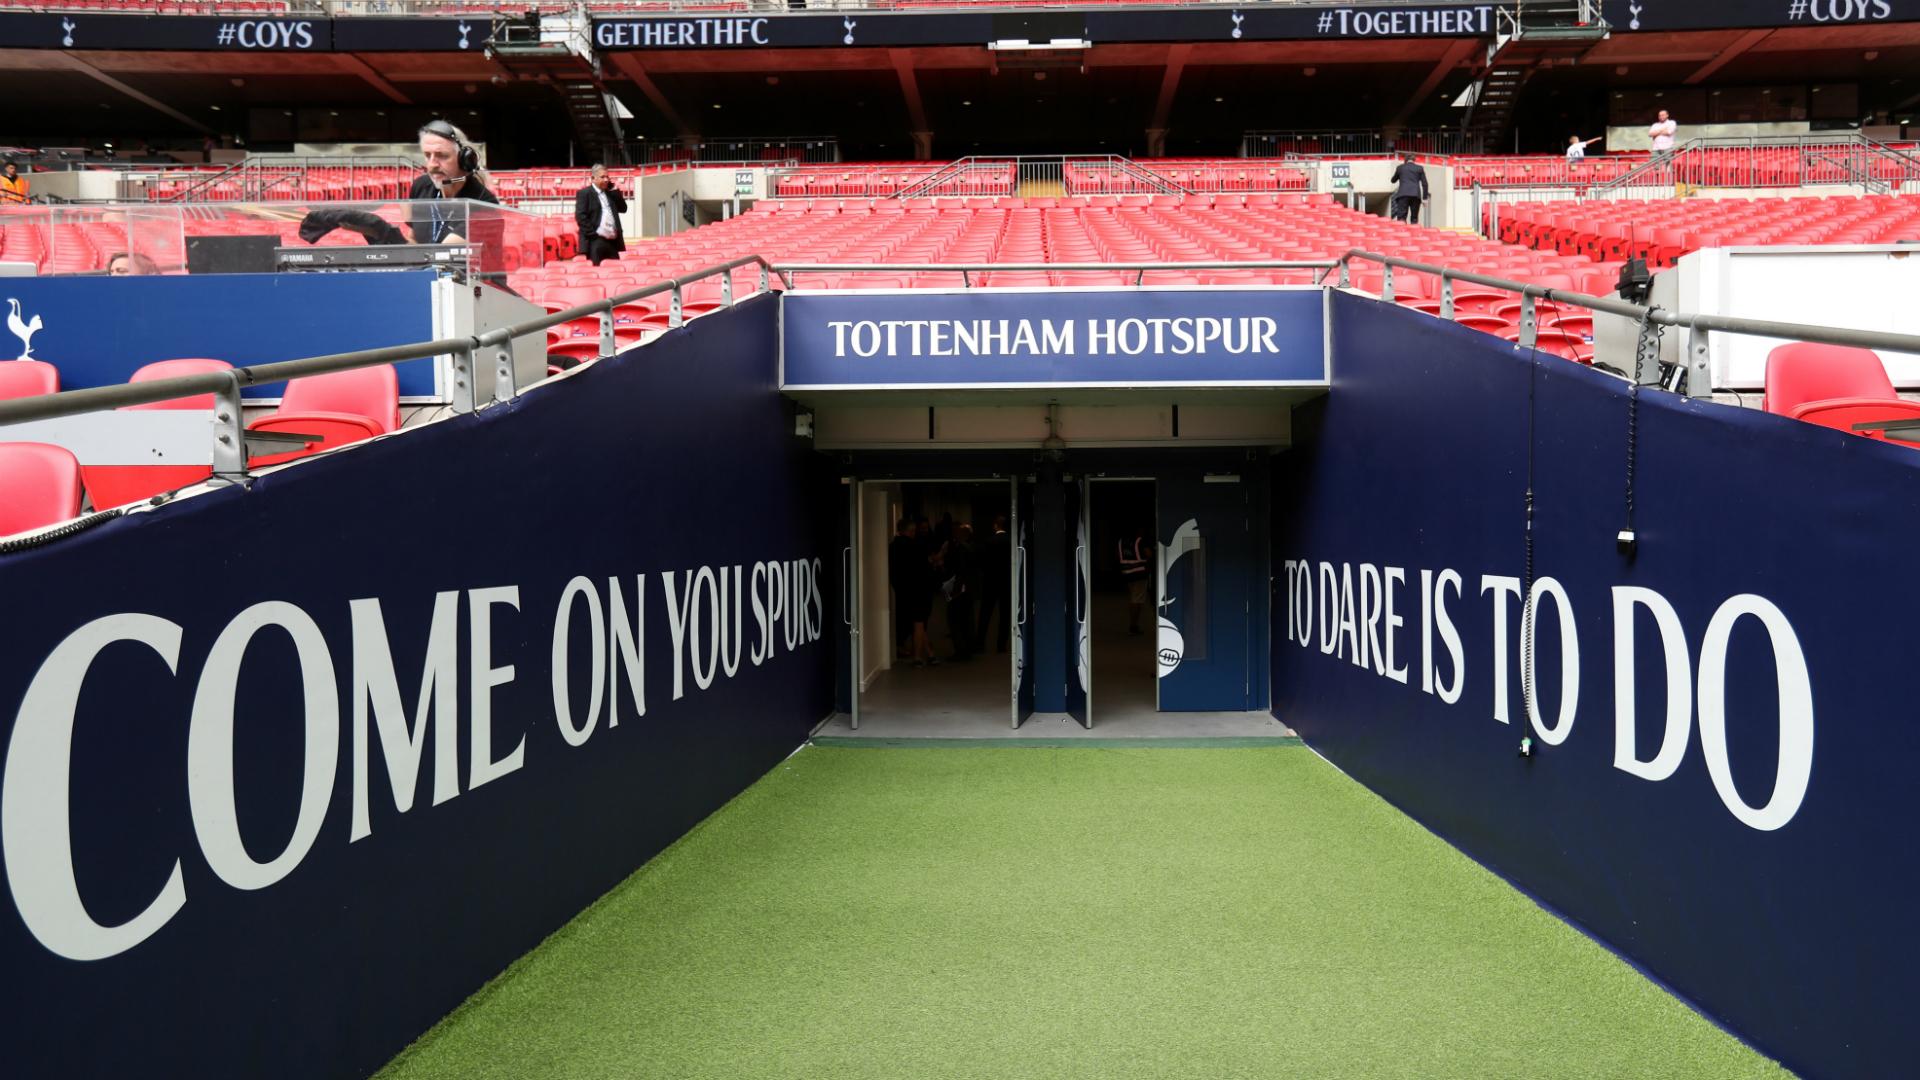 Wembley-cropped_b1qjhs6r2opt1knkghsu9cjer